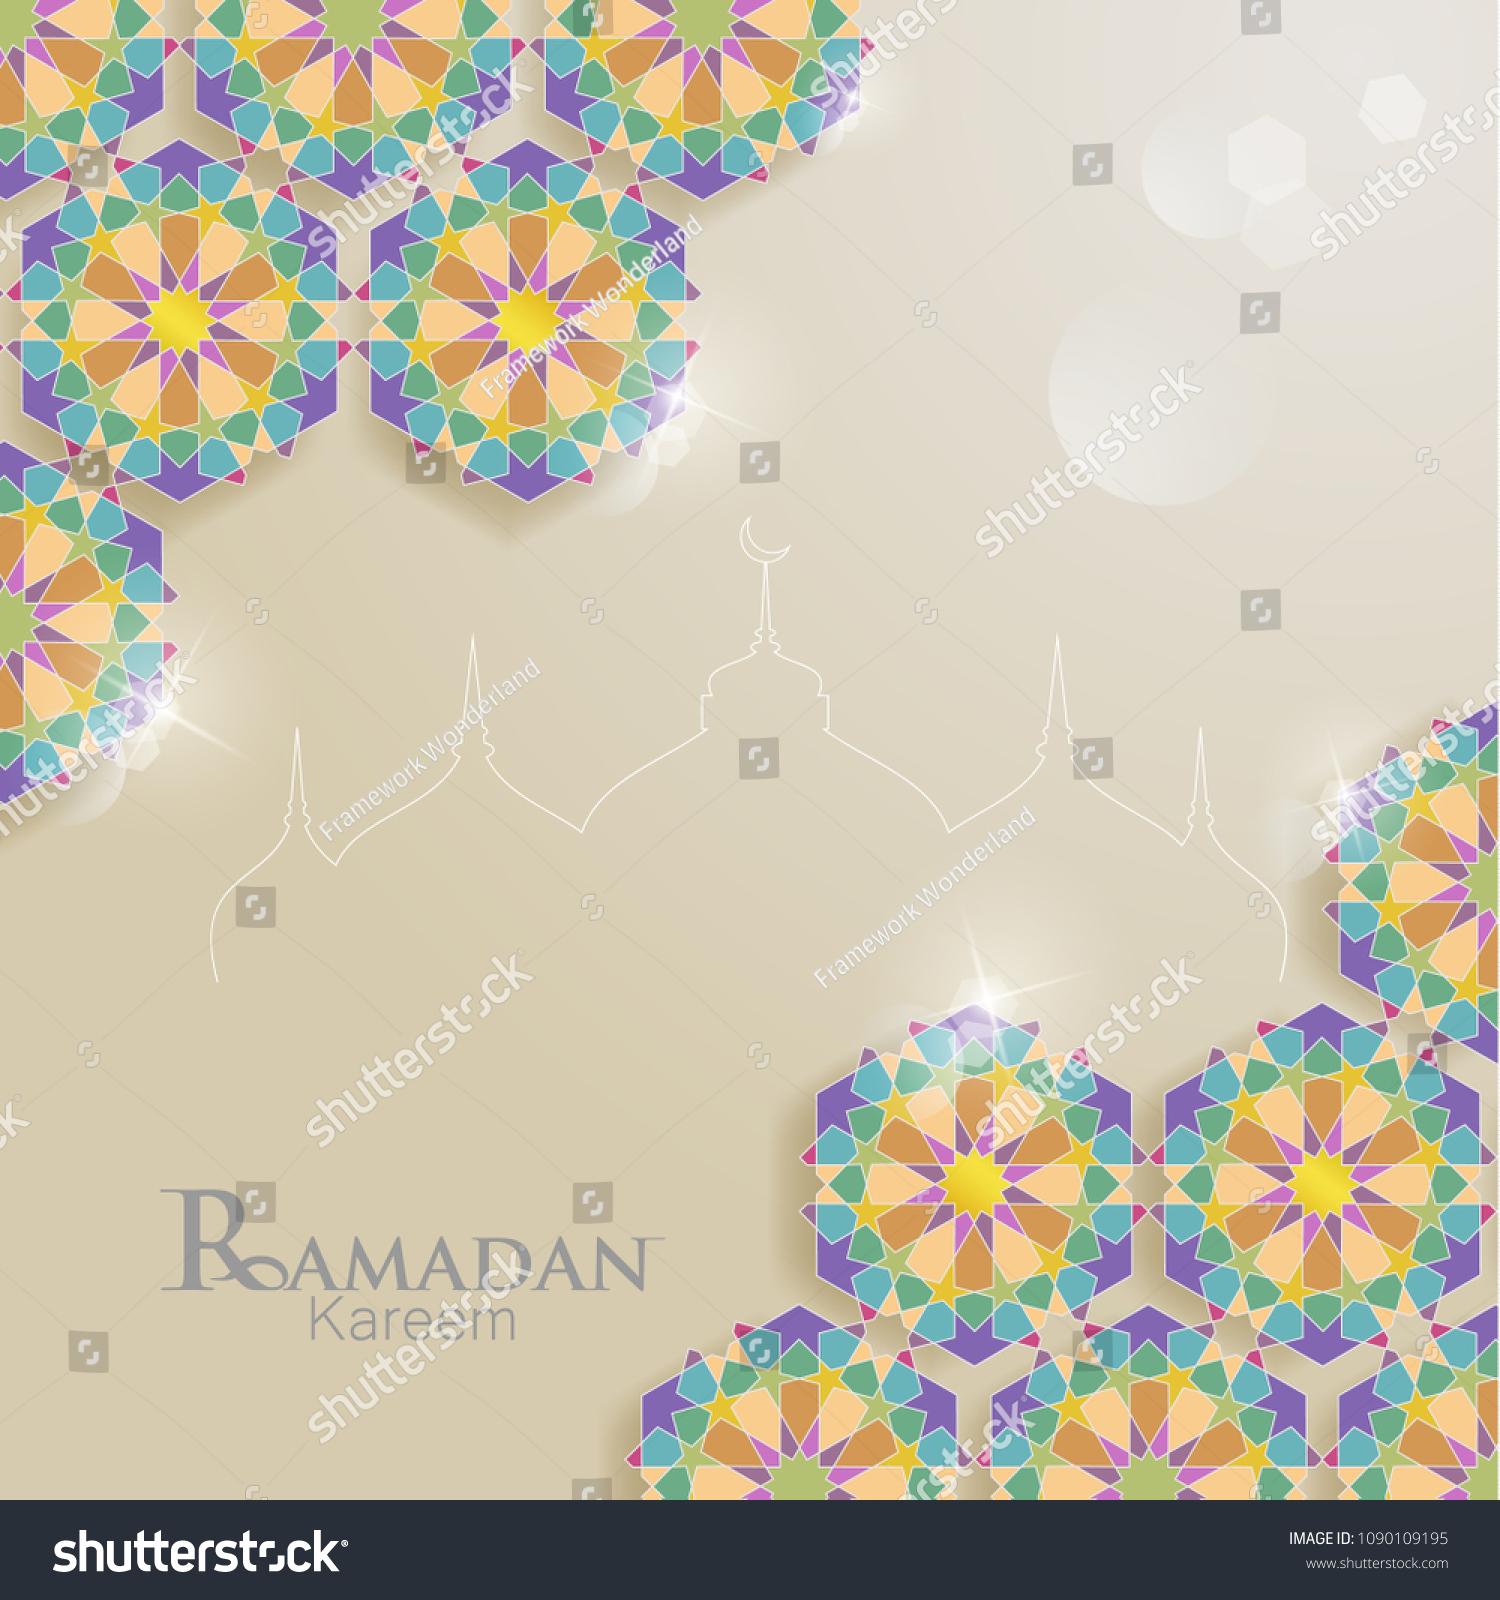 Islamic Ornaments Beautiful Colors Illustrations Greeting Stock